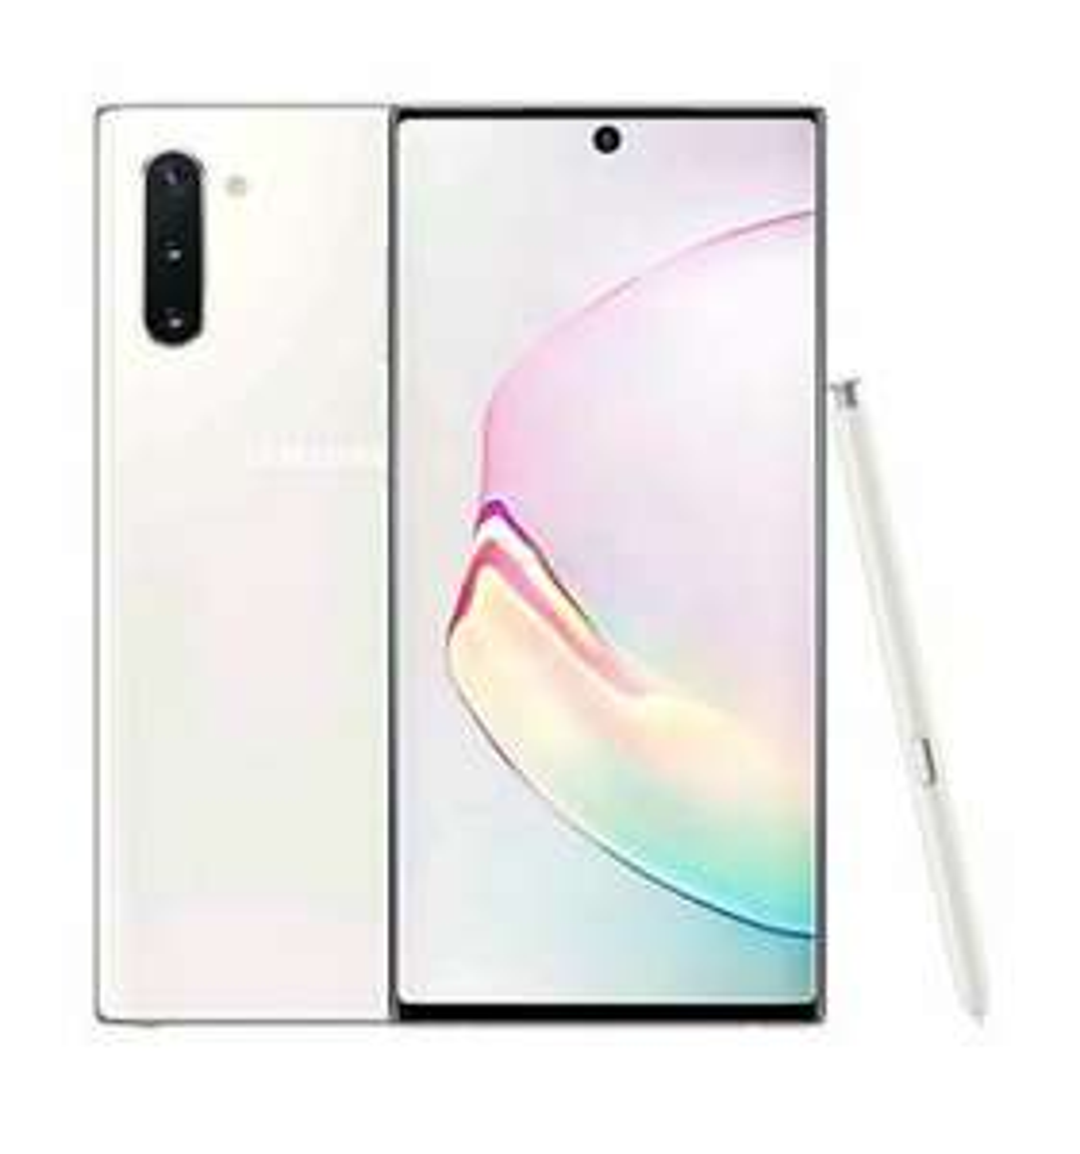 "Smartphone 6.3"" Samsung Galaxy Note 10 - 256 Go, Blanc (645.64€ via le code PTECHOCT19)"